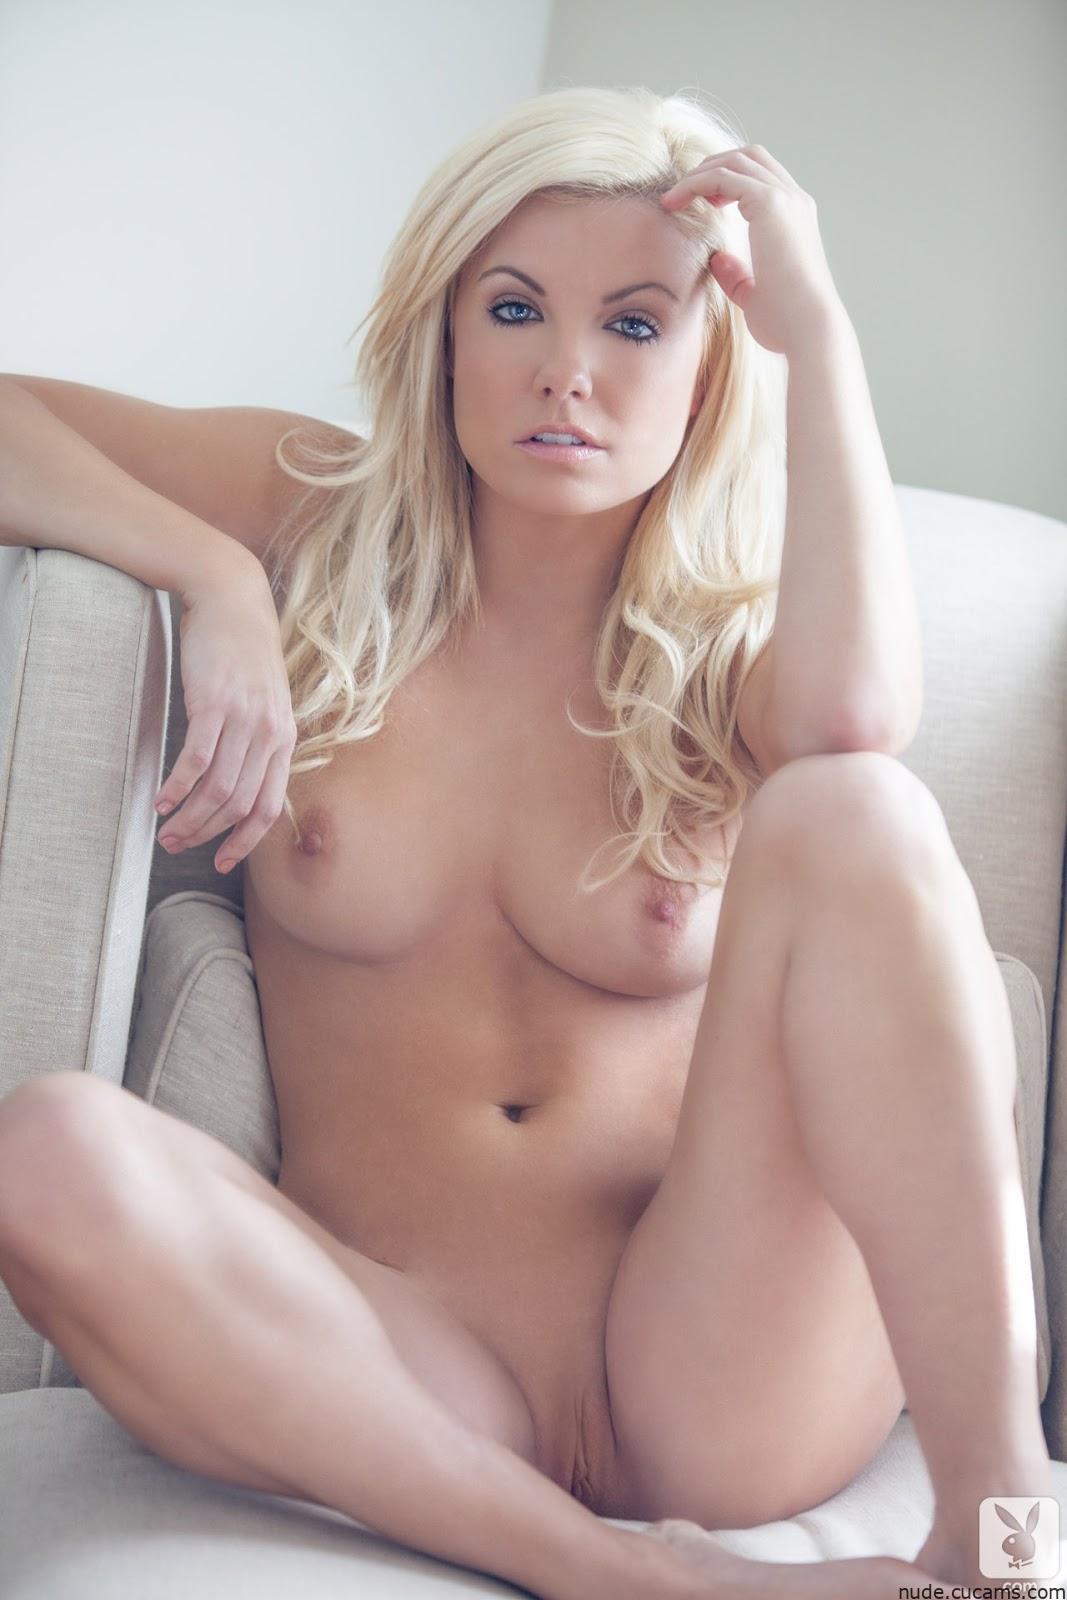 Nude MILF Posing by nude.cucams.com